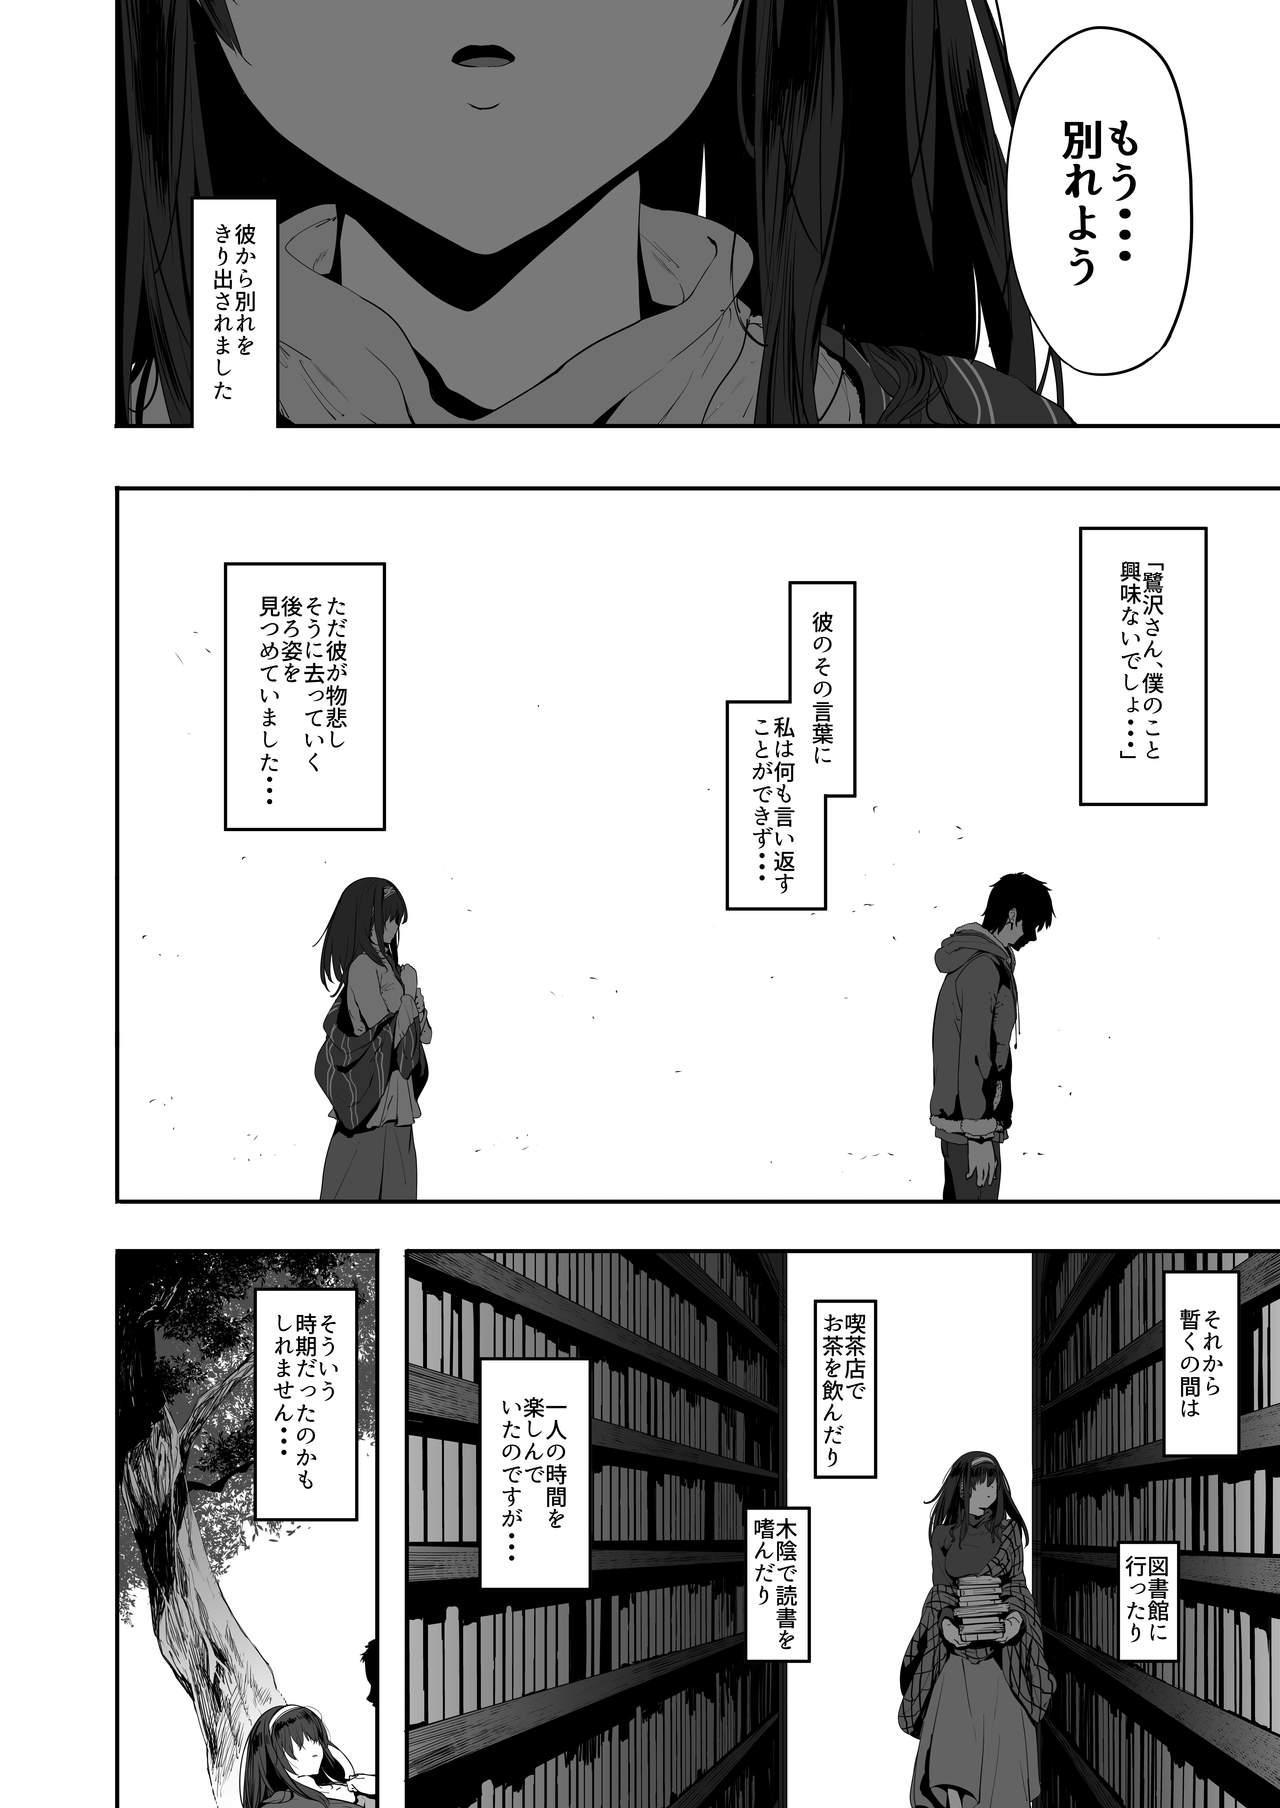 Sagisawa Fumika wa Yoku Moteru 5